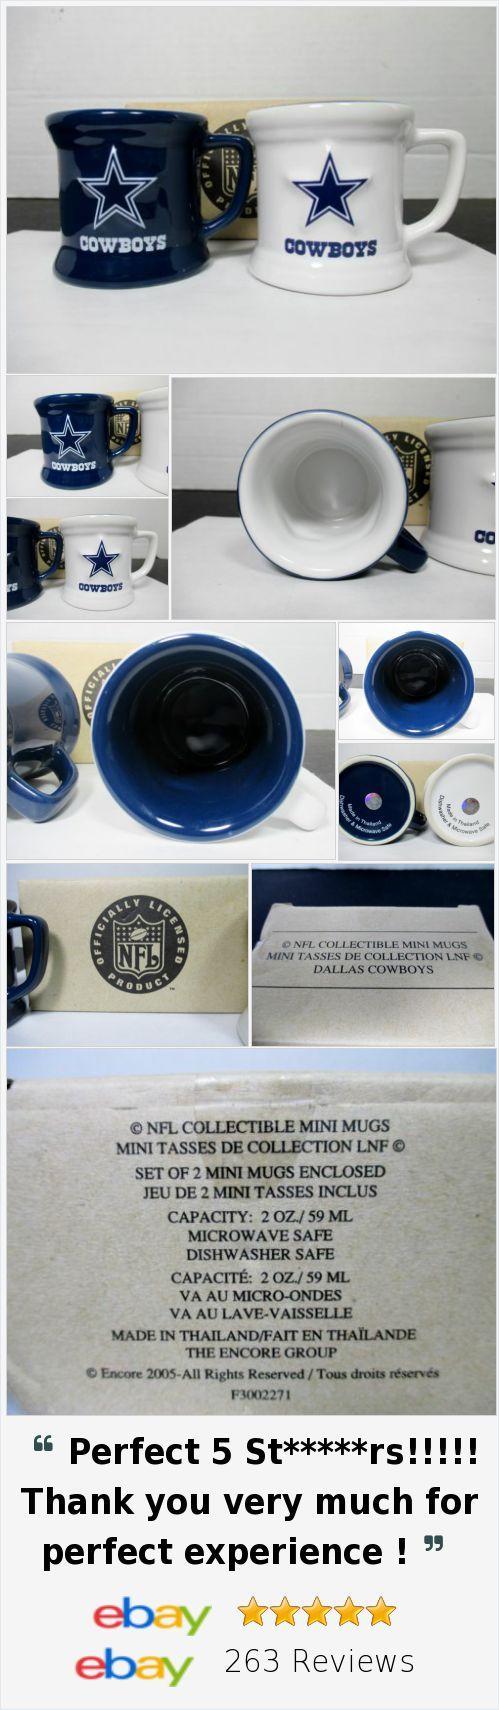 Dallas Cowboys Set Of 2 Collectible Mini Mugs 2 ounce Authentic NFL Merchandise